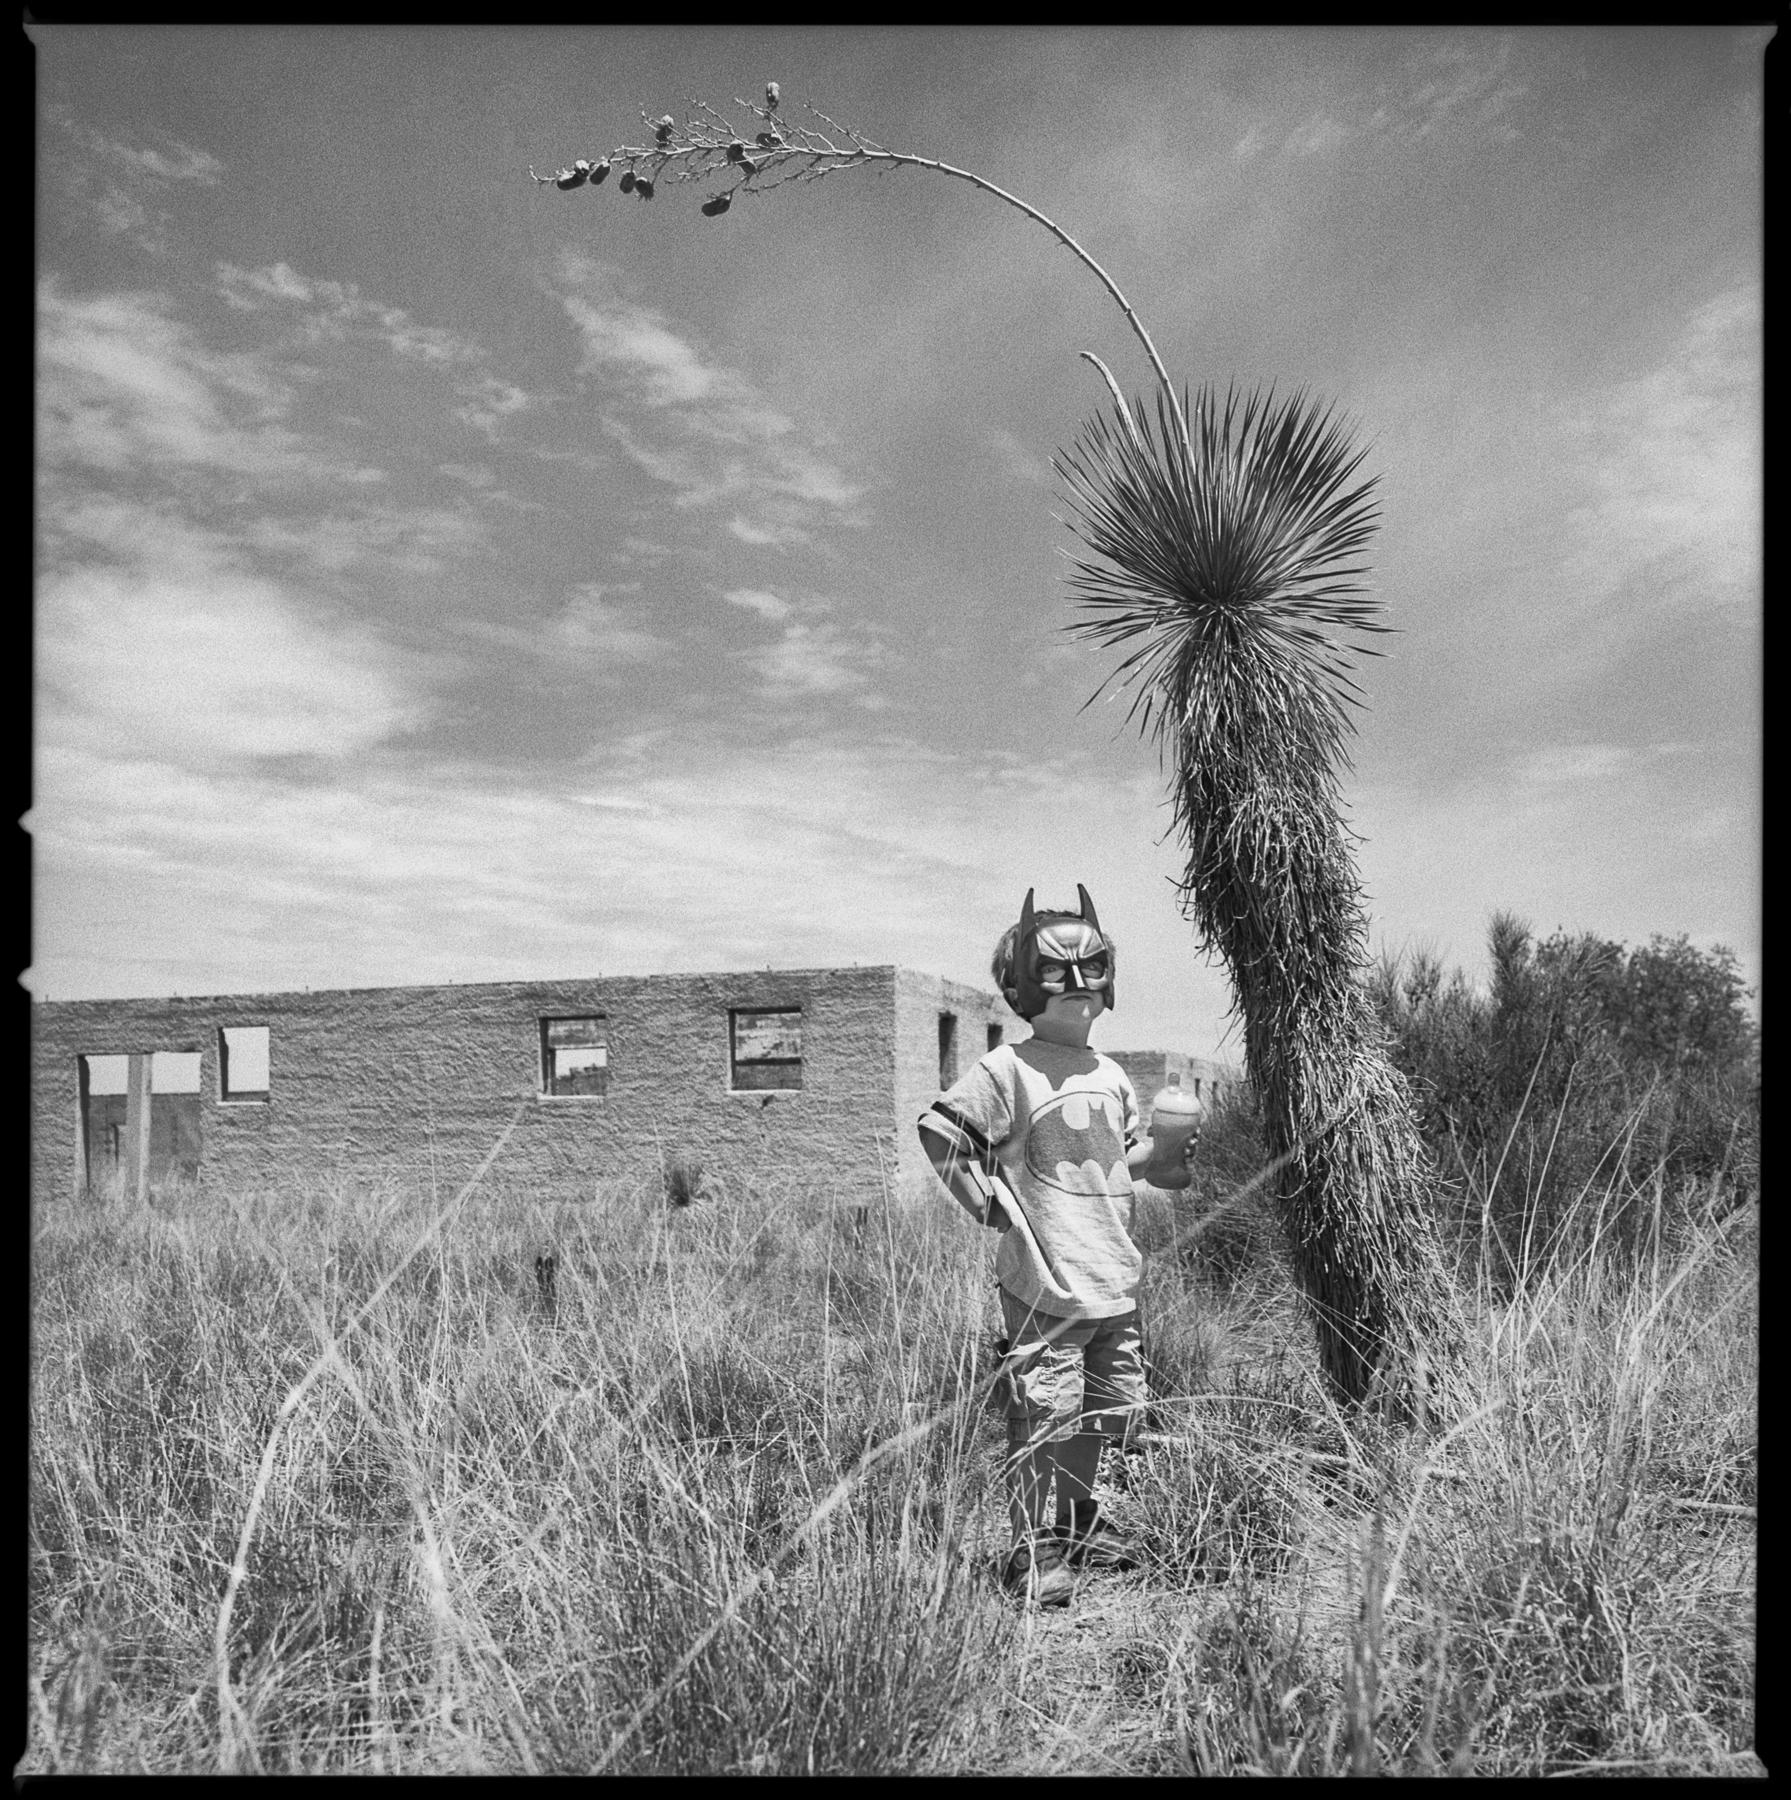 Batboy in the desert Marfa, Texas 2012